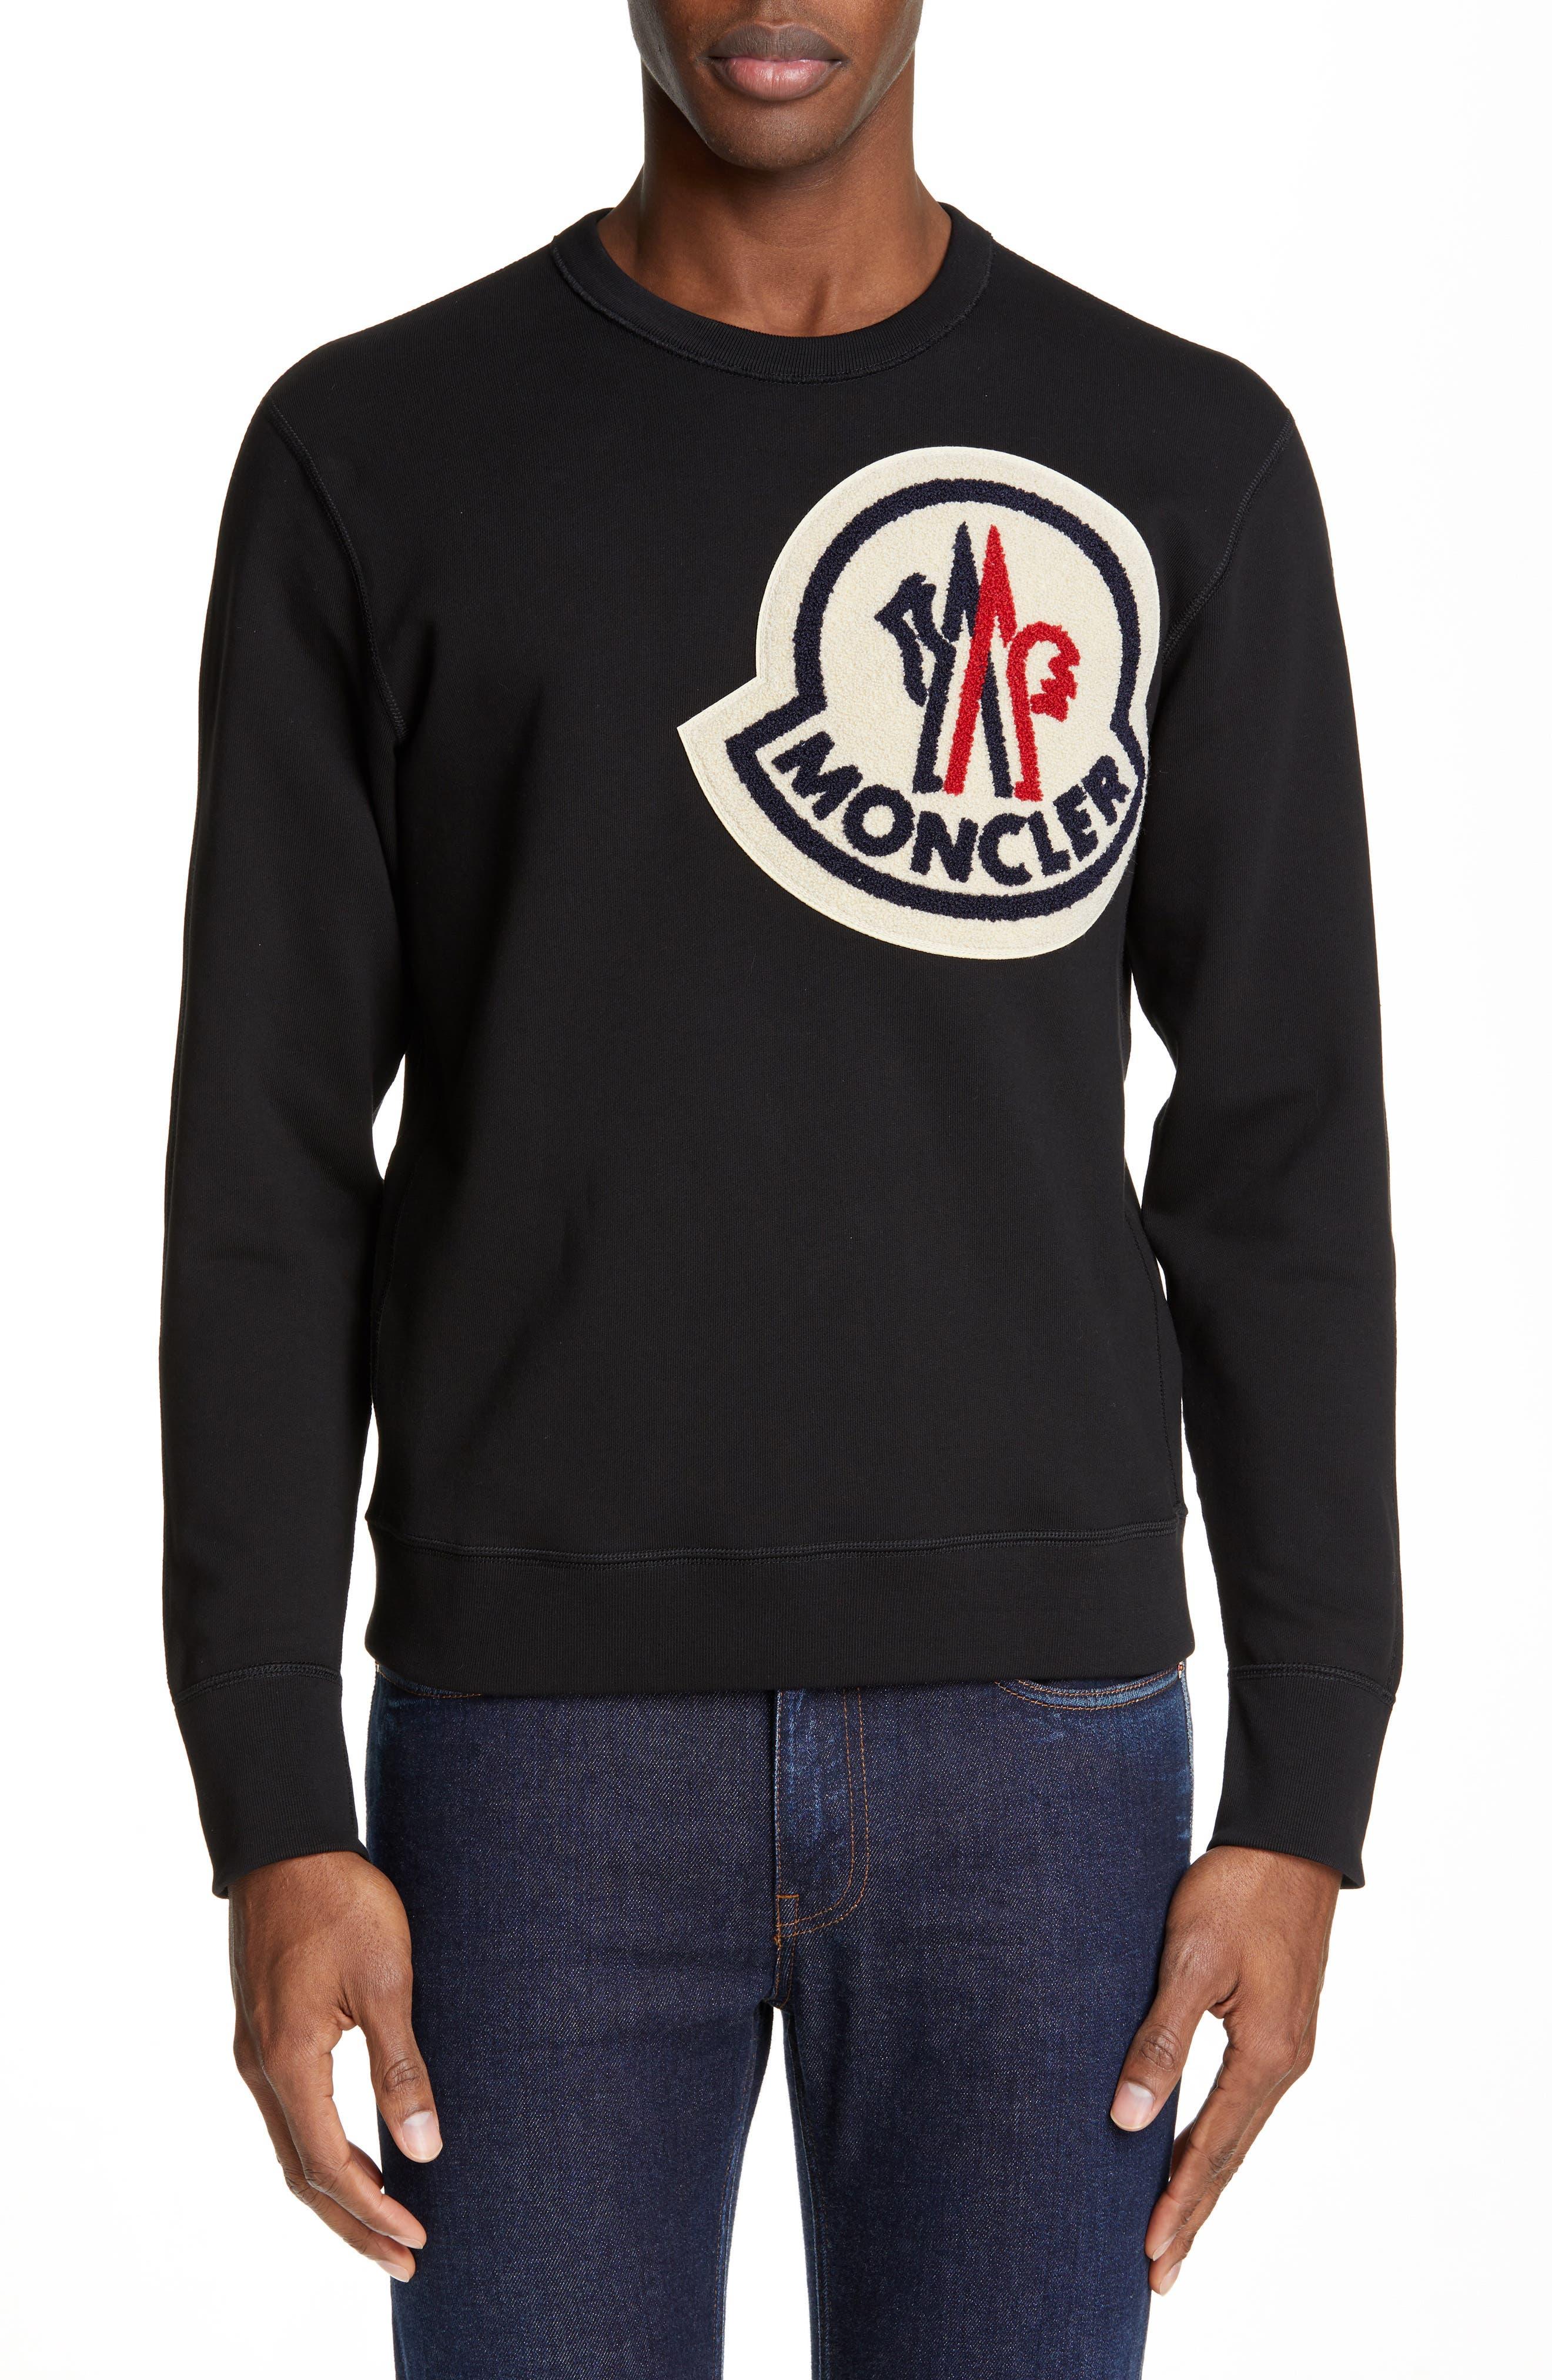 Maglia Sweatshirt, Main, color, BLACK